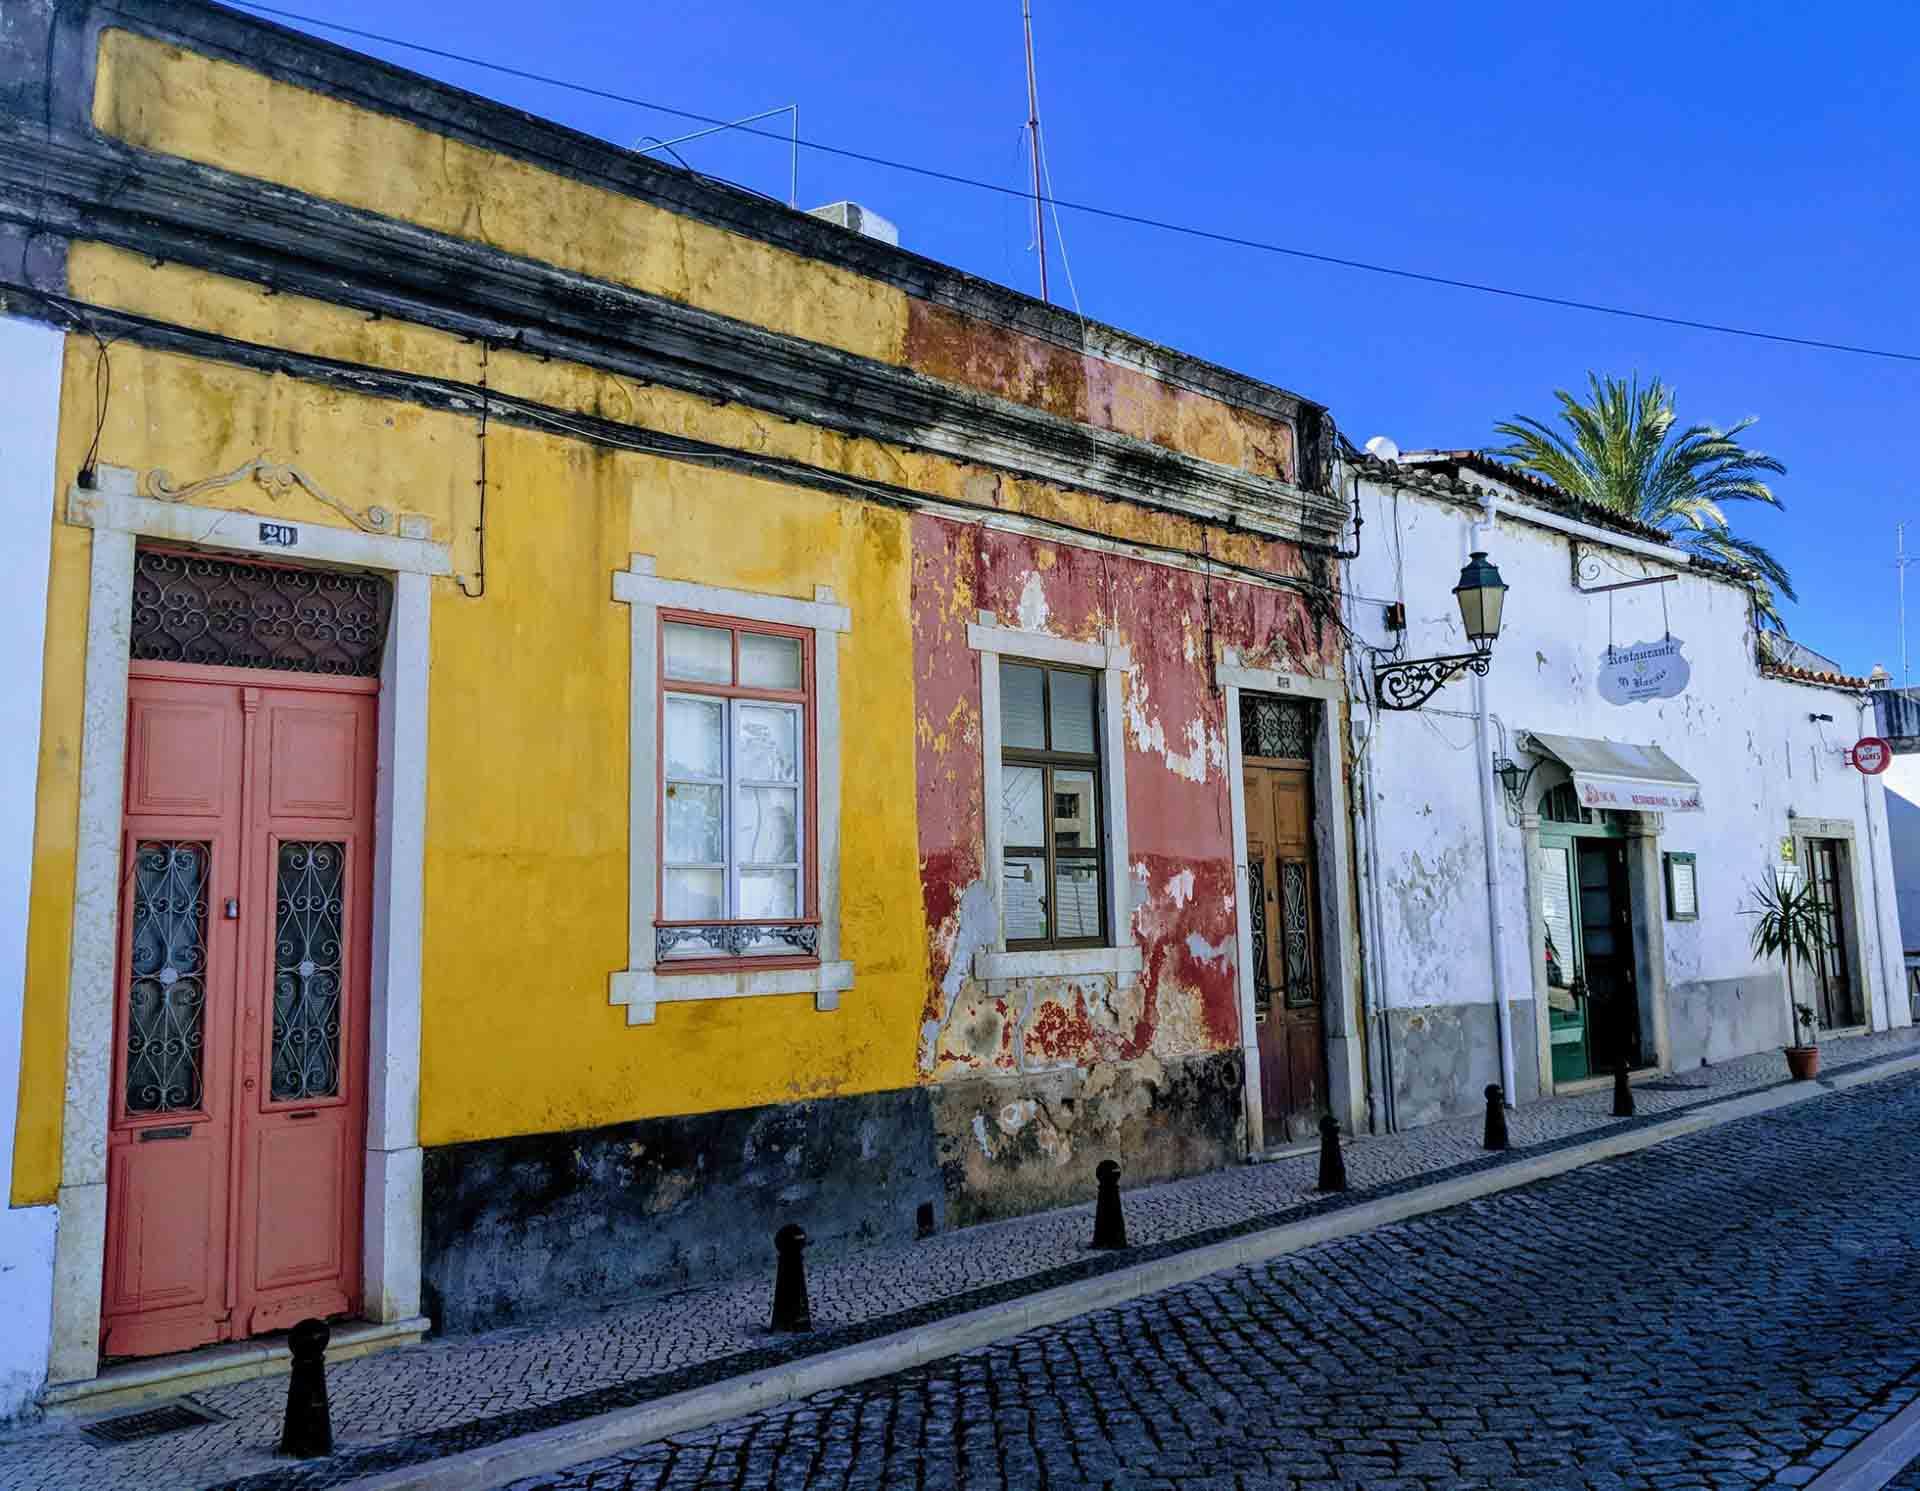 A street in Faro